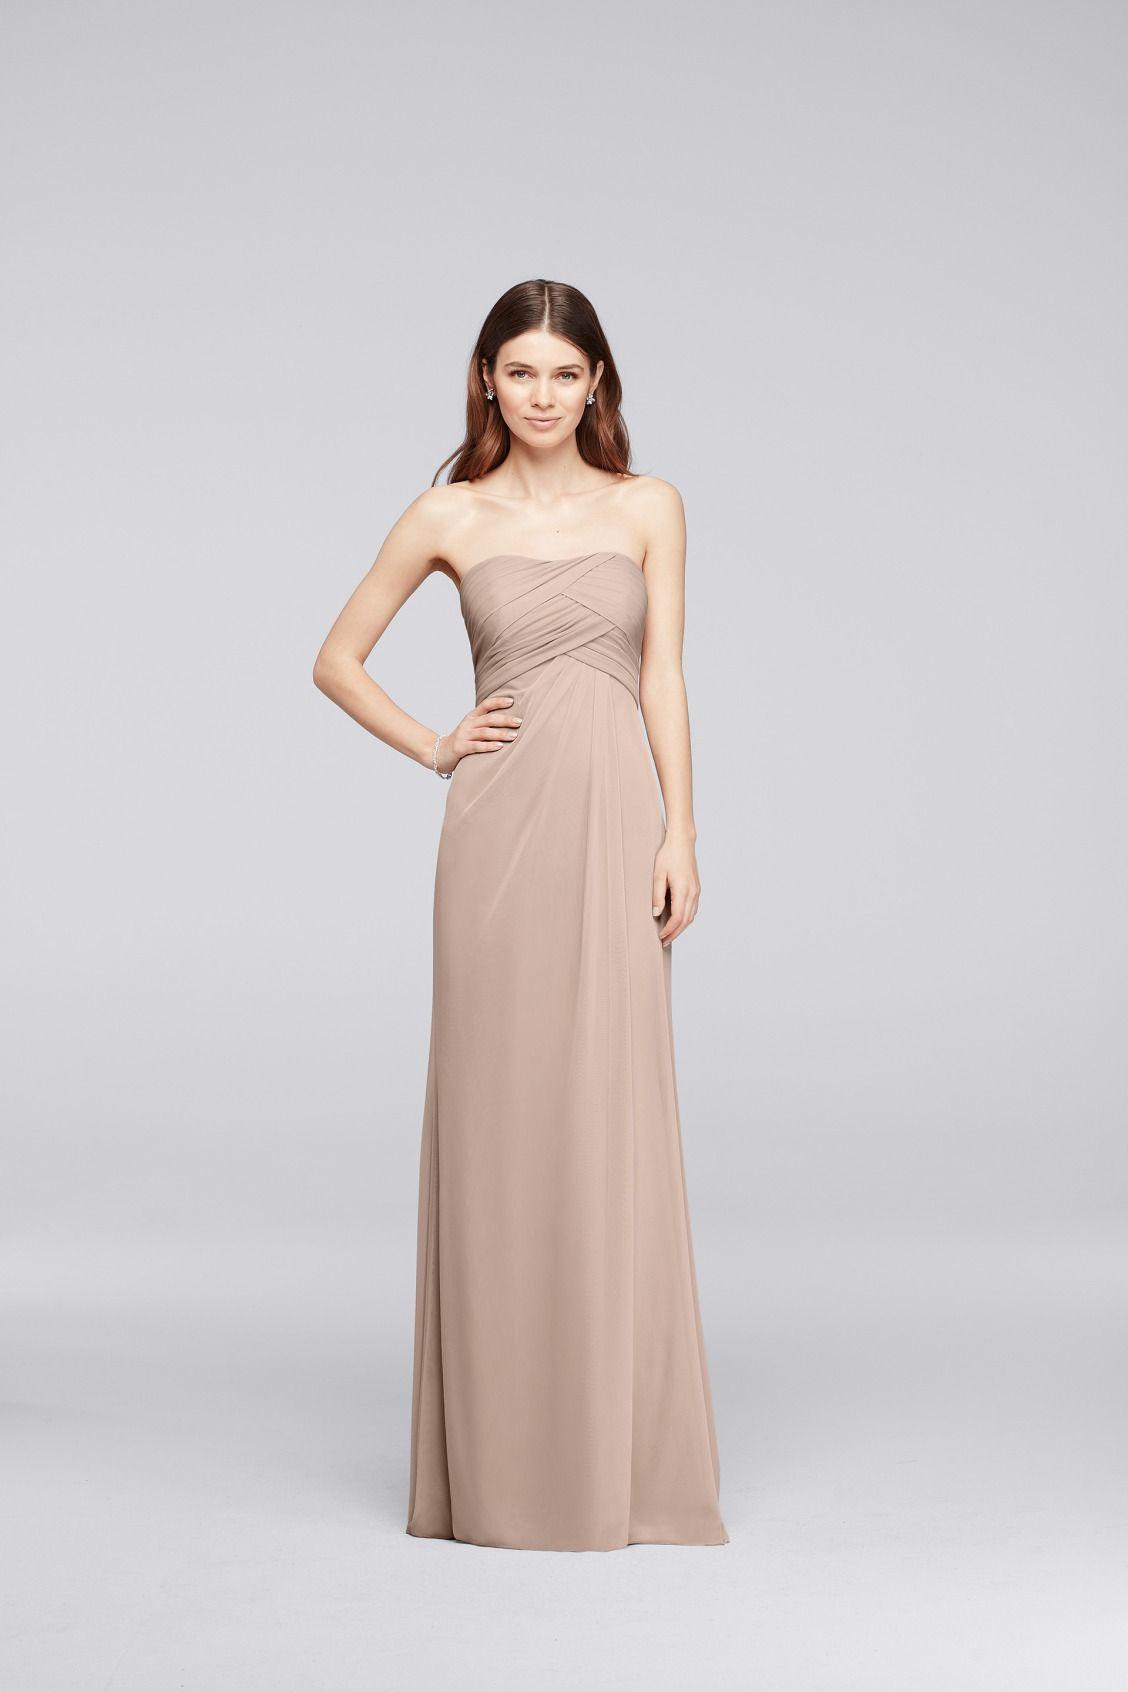 Stunning Mesh Strapless Long Bridesmaid Dress with Pleats available at David us Bridal